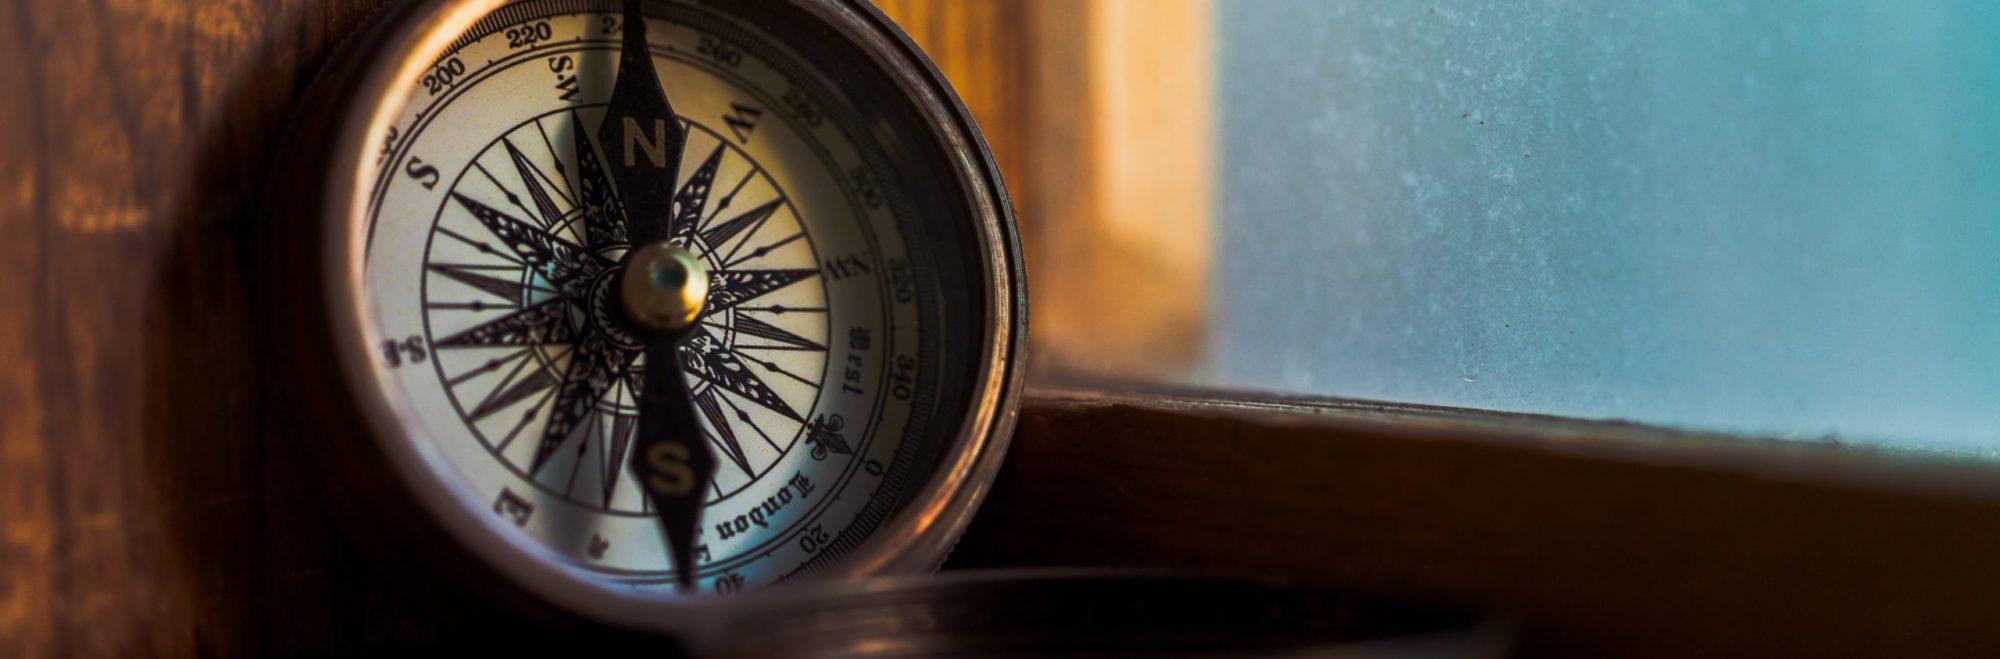 small, old looking compass ©Jordan Madrid, unsplash.com